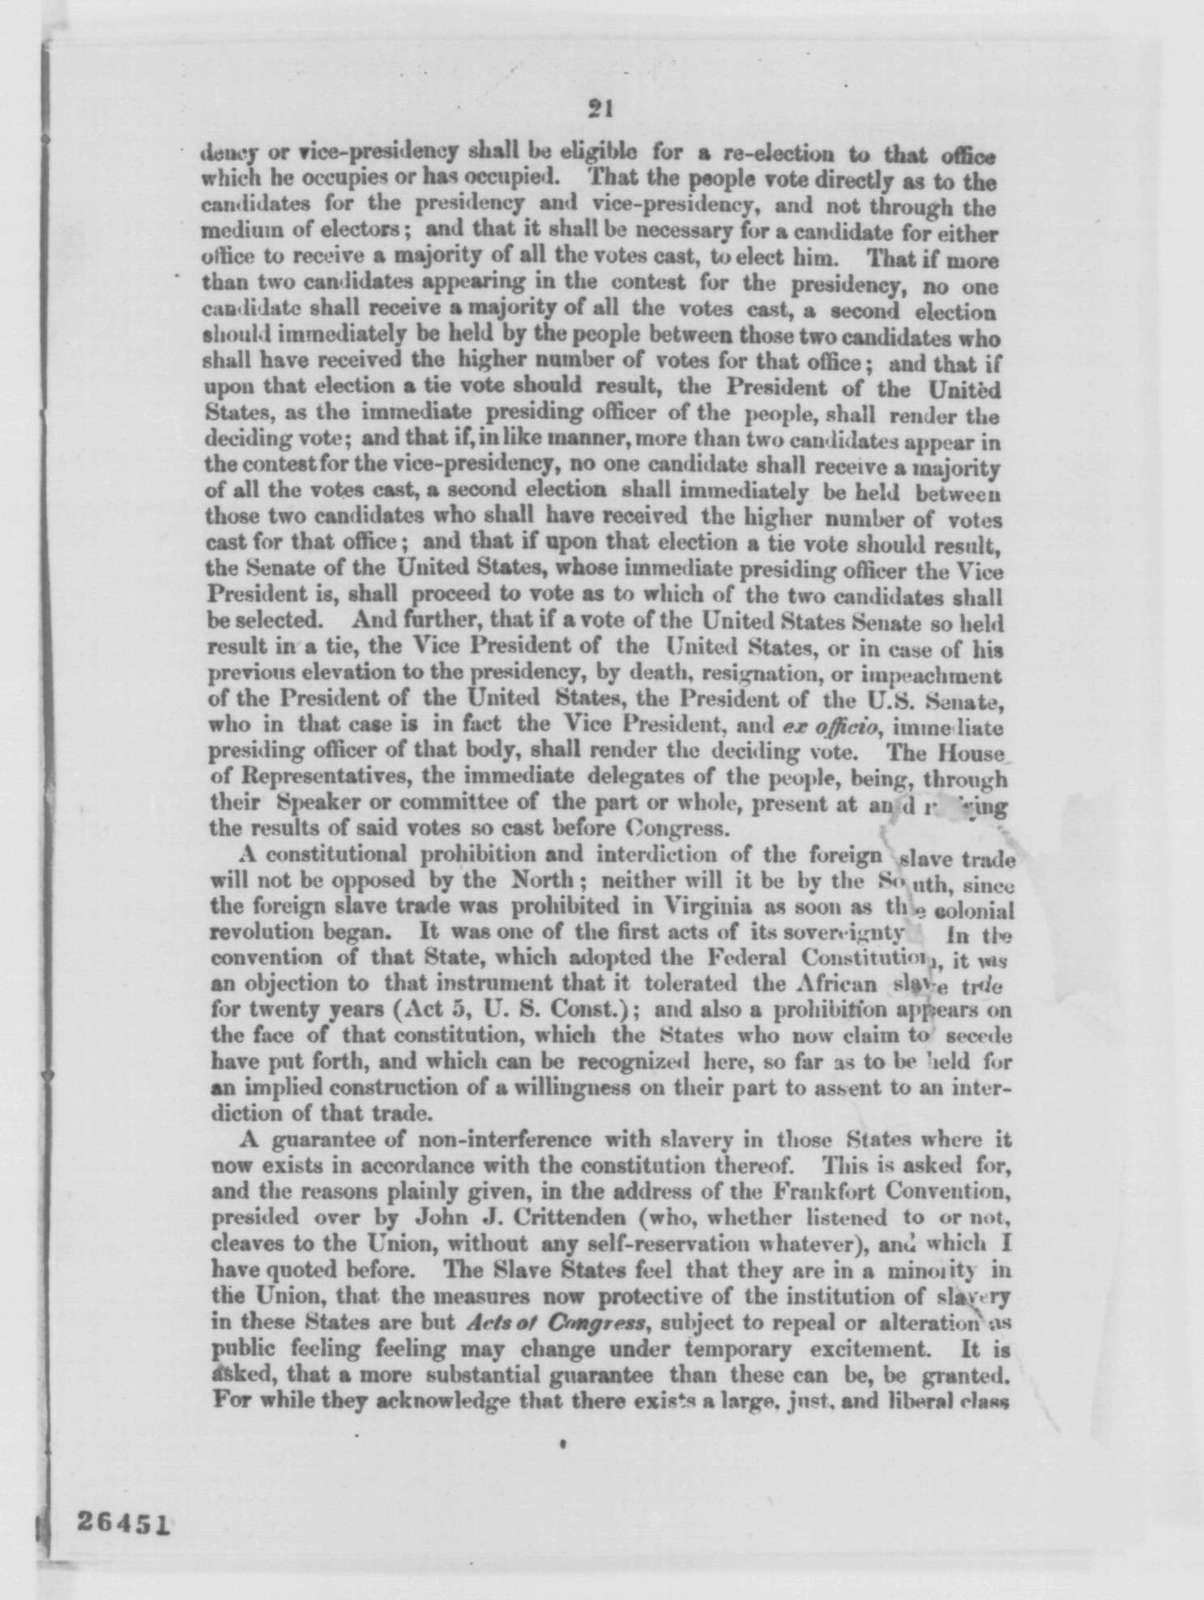 Edward B. Eaton to Abraham Lincoln, Monday, September 21, 1863  (Sends pamphlet)